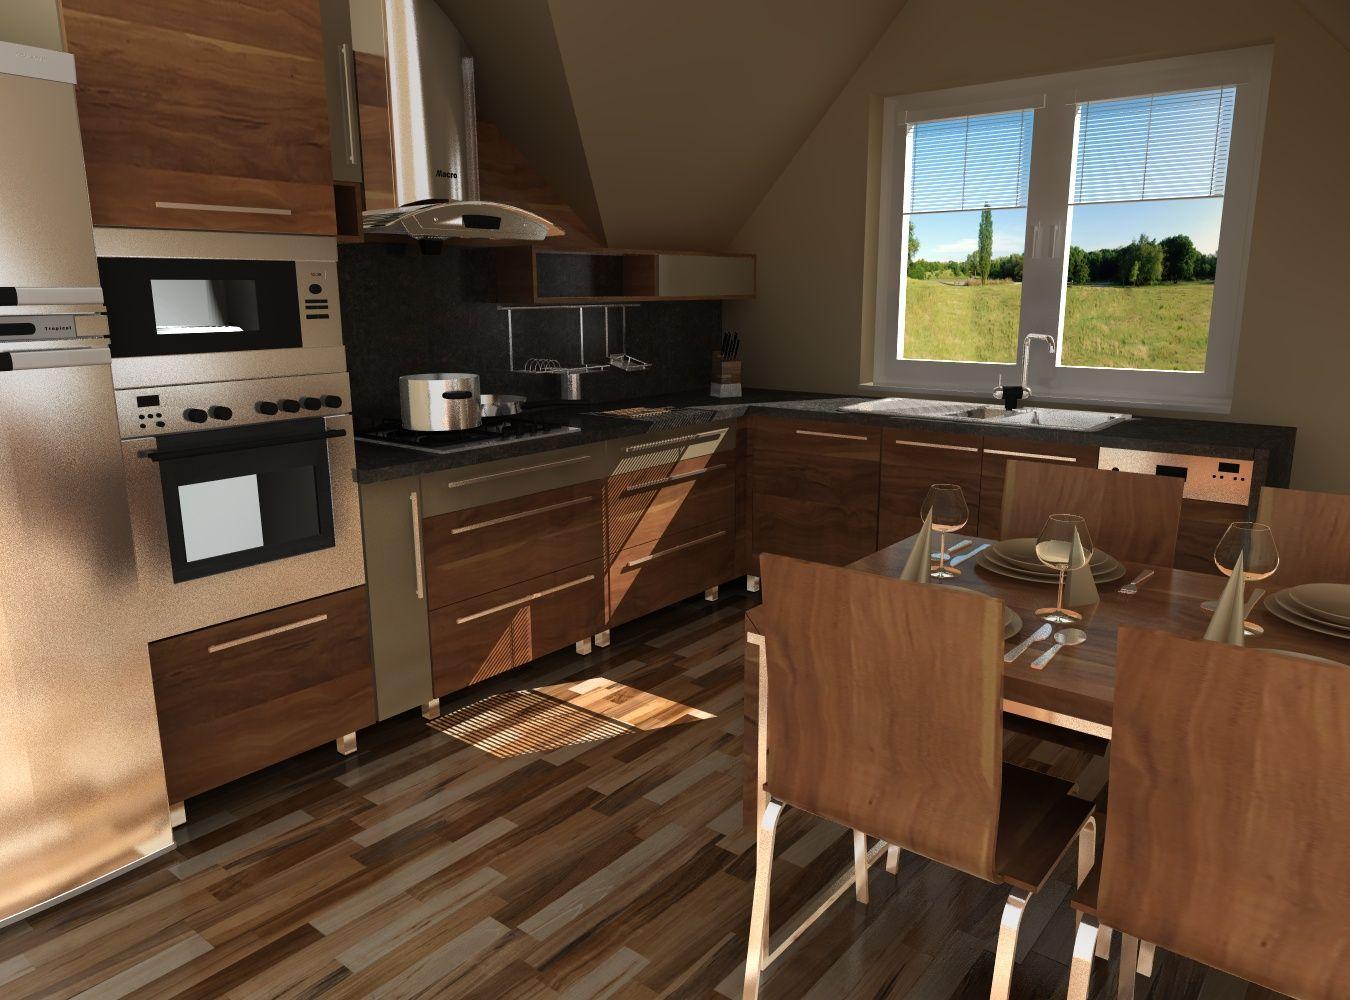 Kitchen 3d Rendering Software